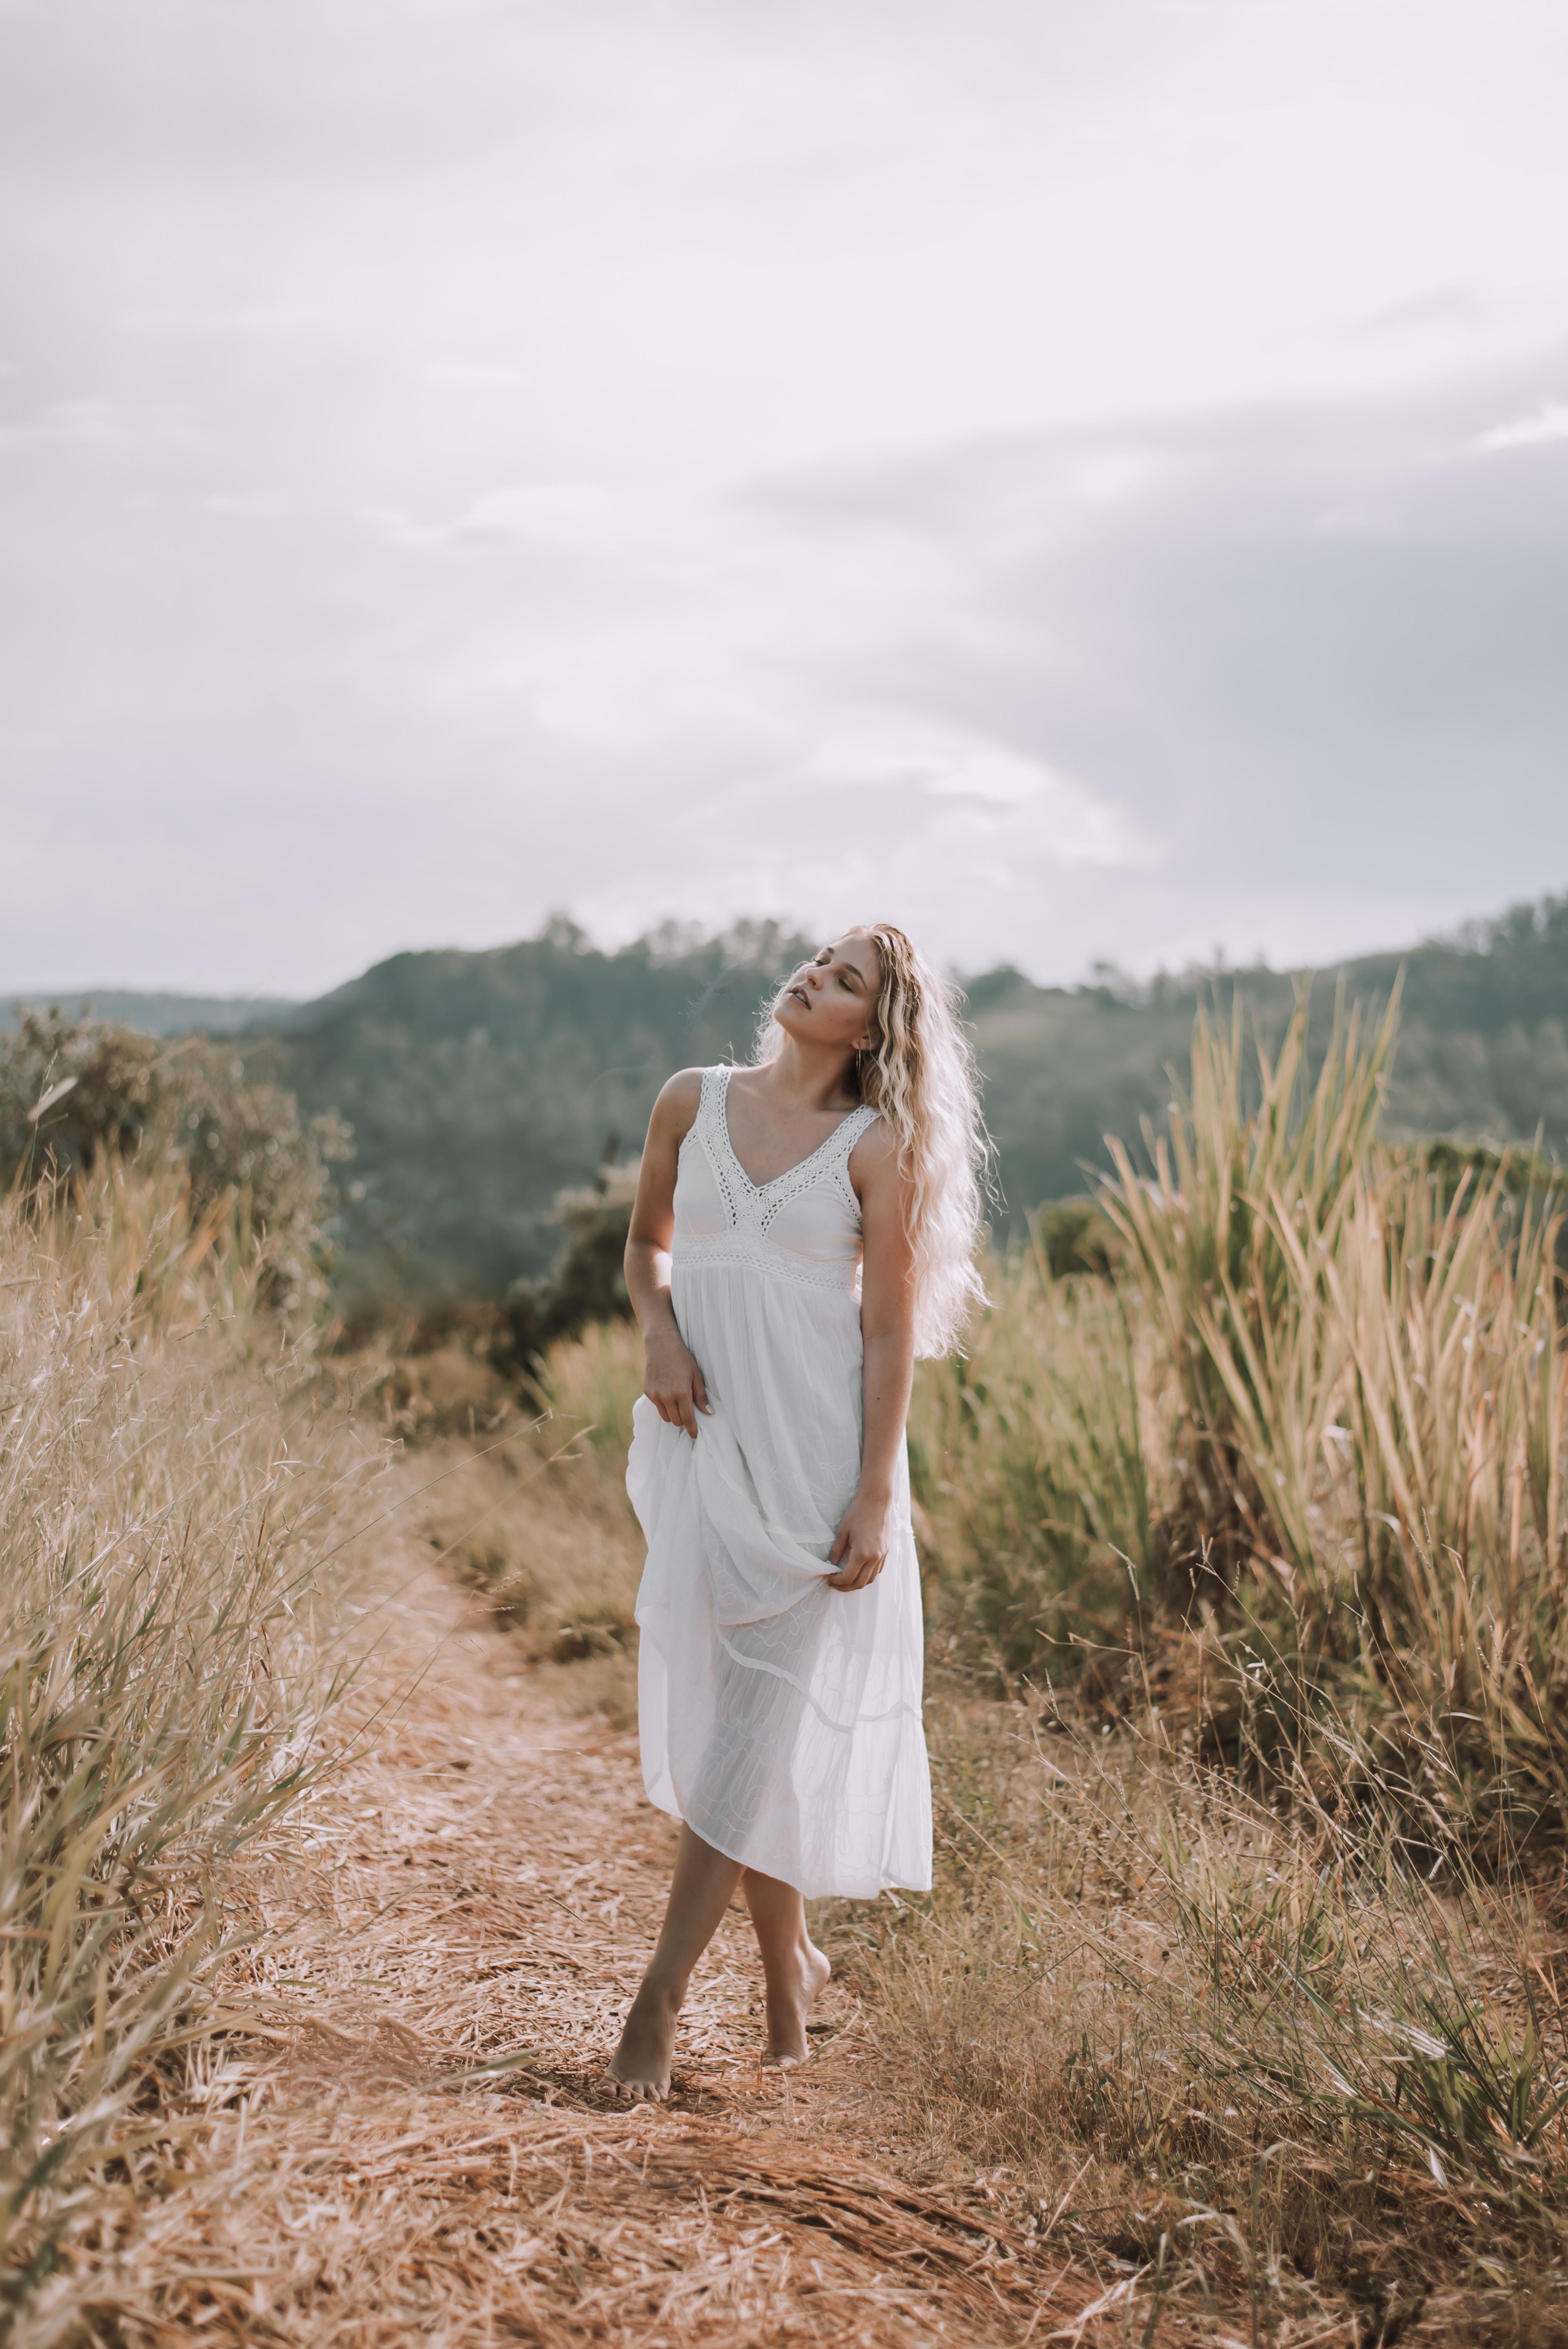 standing woman wearing white sleeveless dress during daytime